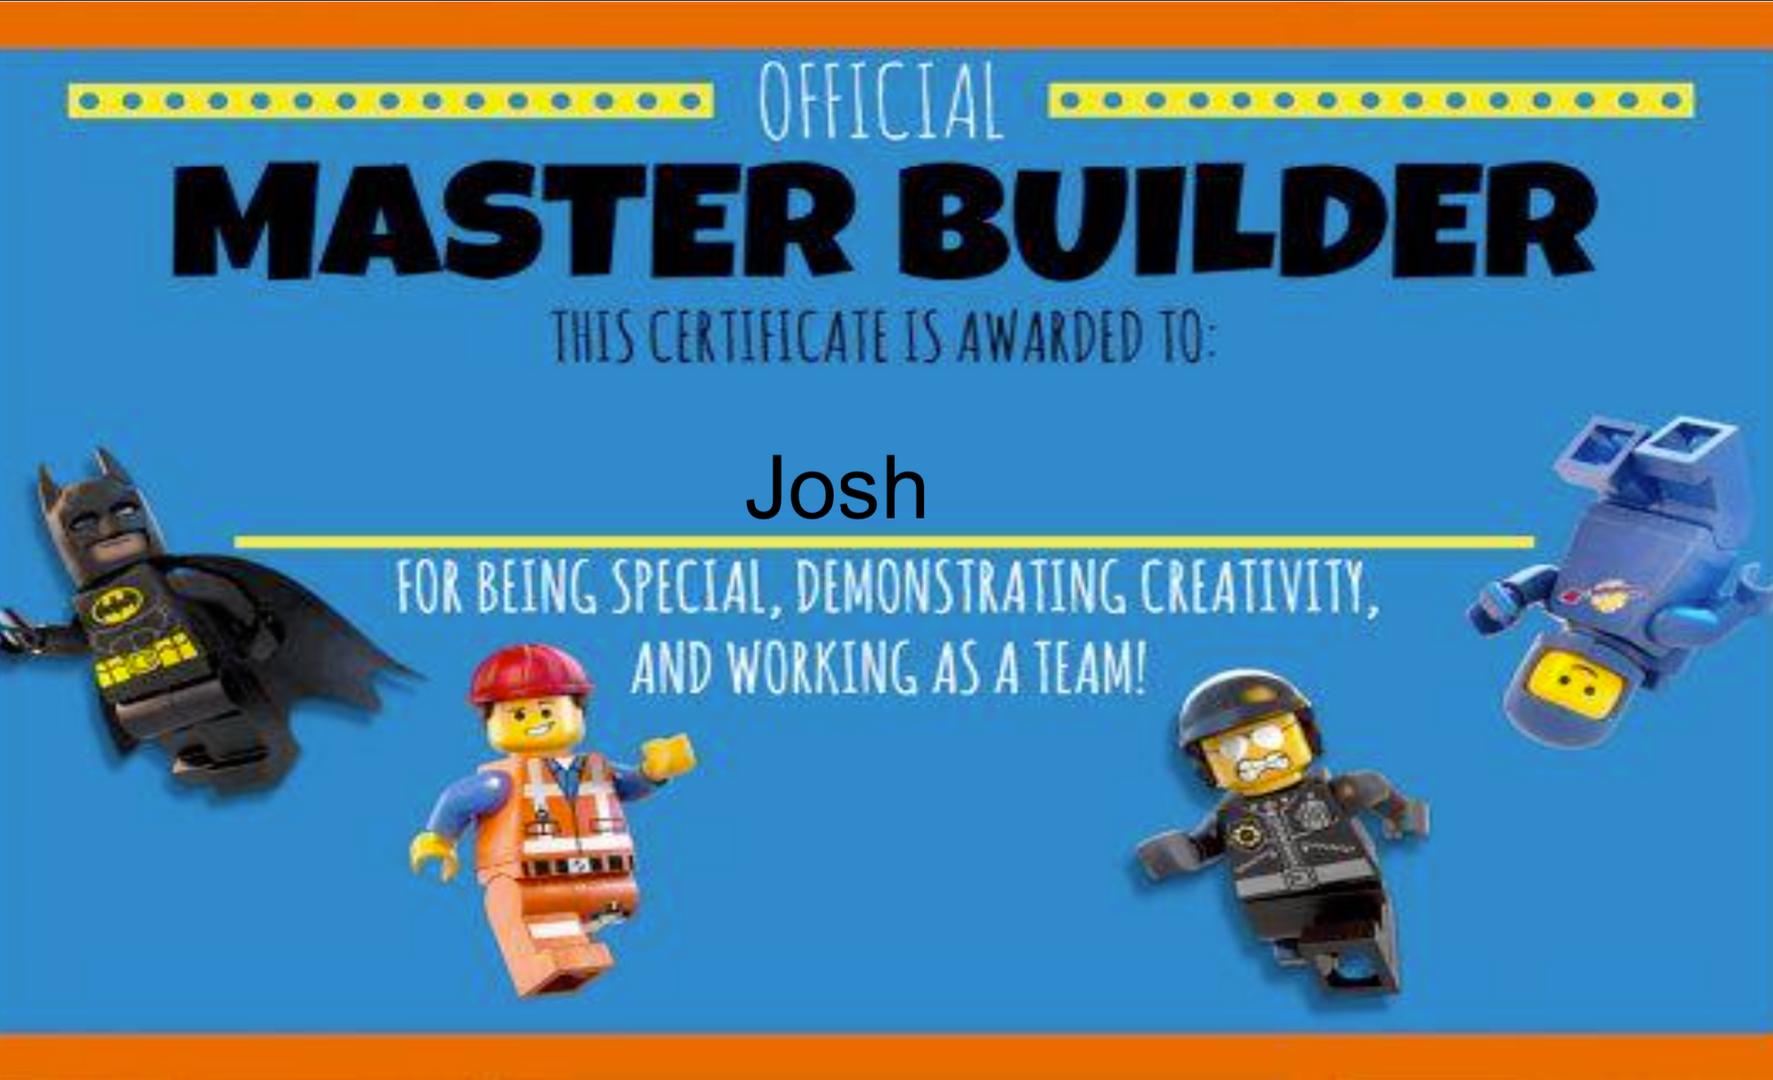 Lego Challenges - Josh's Master Builder Certificate